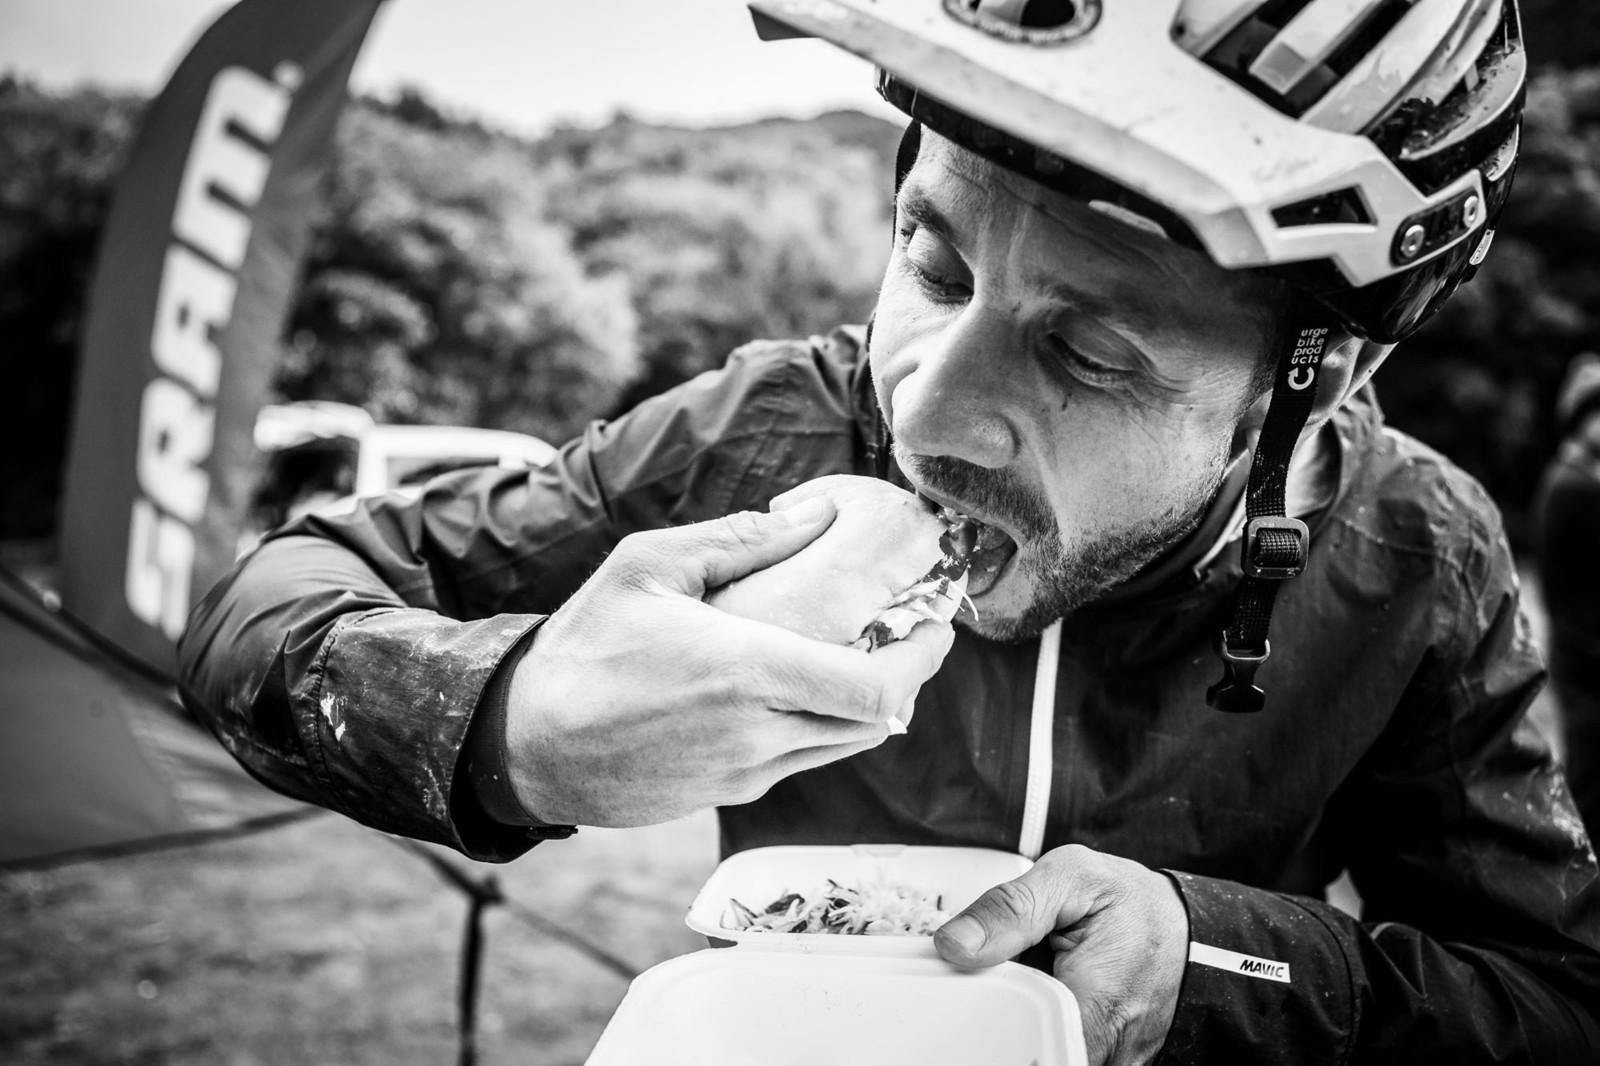 NZEnduro19 BB AS6I0557 - 2019 NZ Enduro Day 1 Photo Gallery - Mountain Biking Pictures - Vital MTB